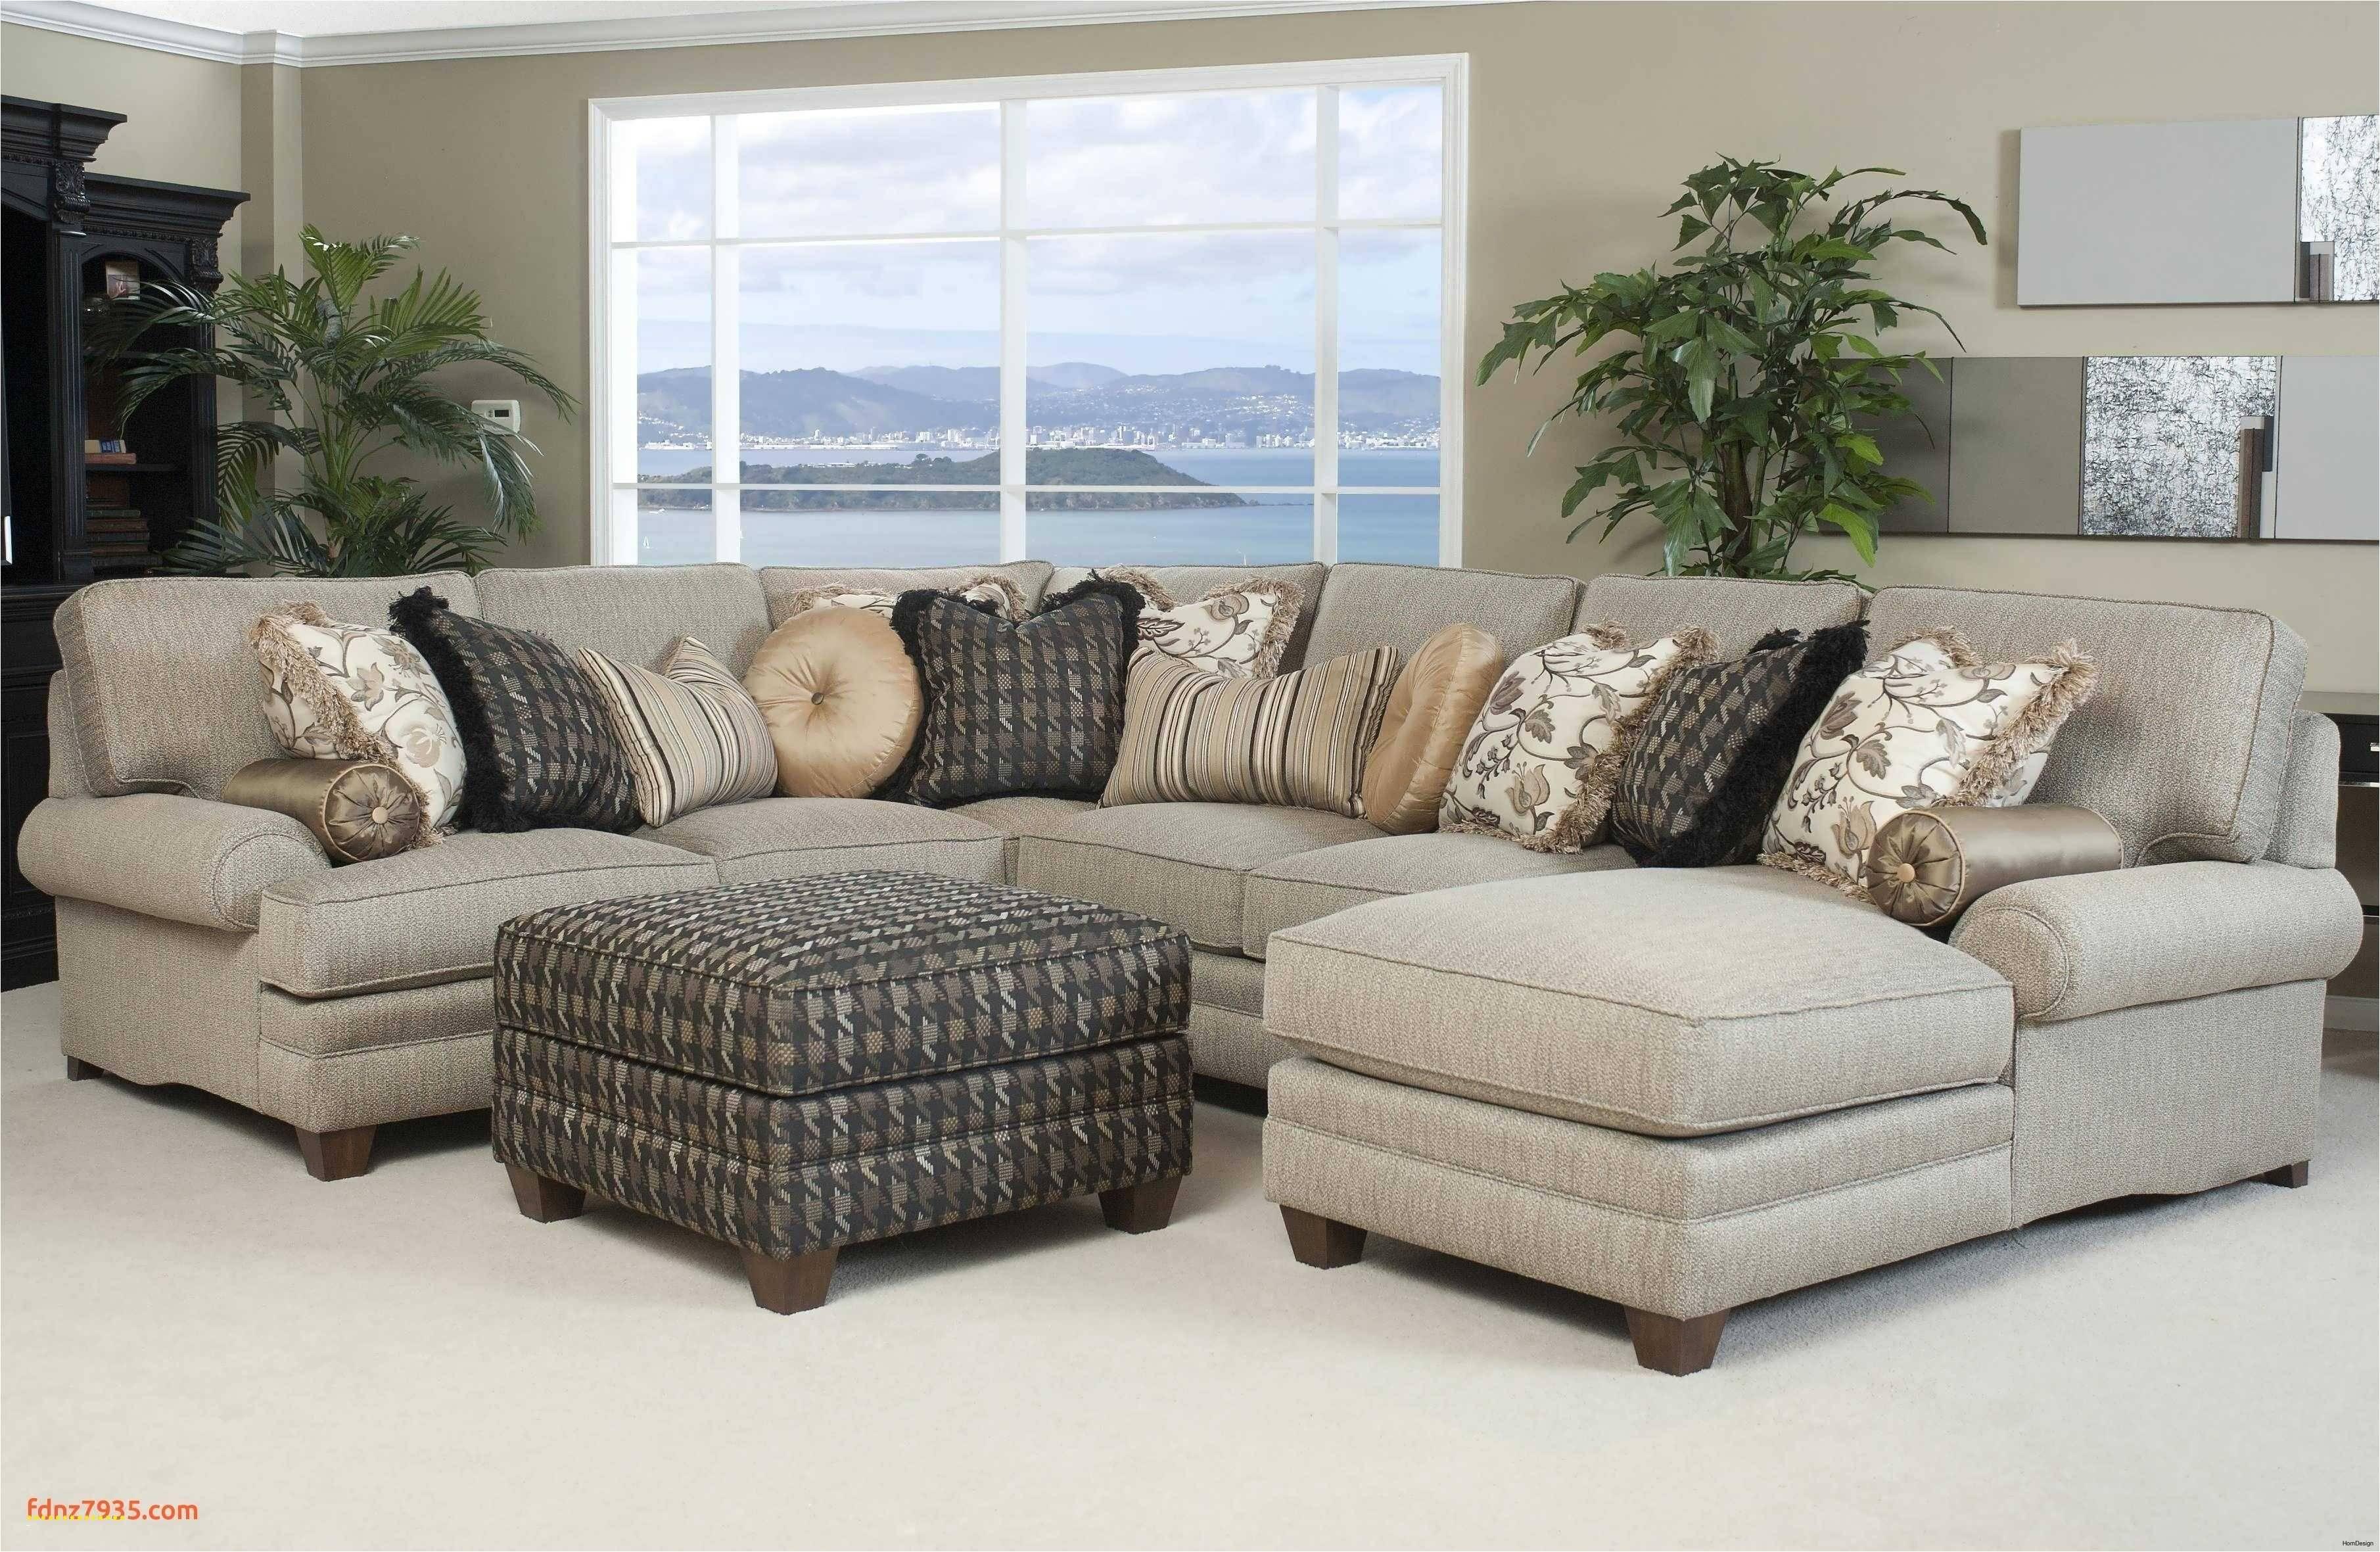 sofa ke design furniture awesome luxury l shaped sofa home interior design list of interior of sofa ke design furniture